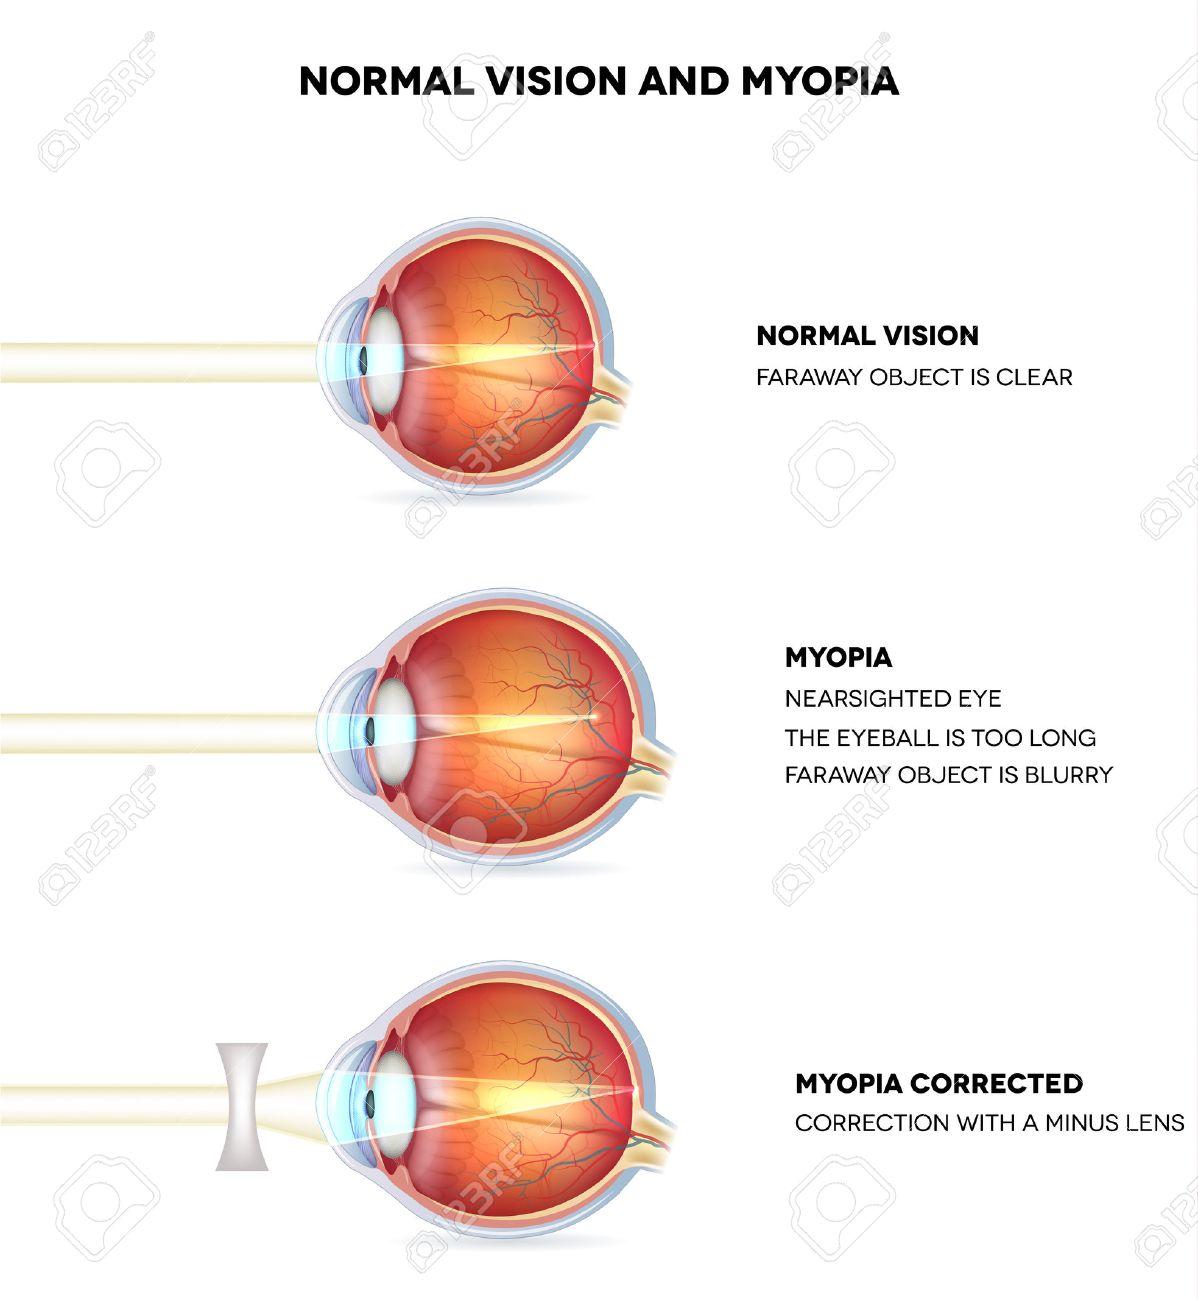 Myopia And Normal Vision Myopia Is Being Shortsighted Myopia